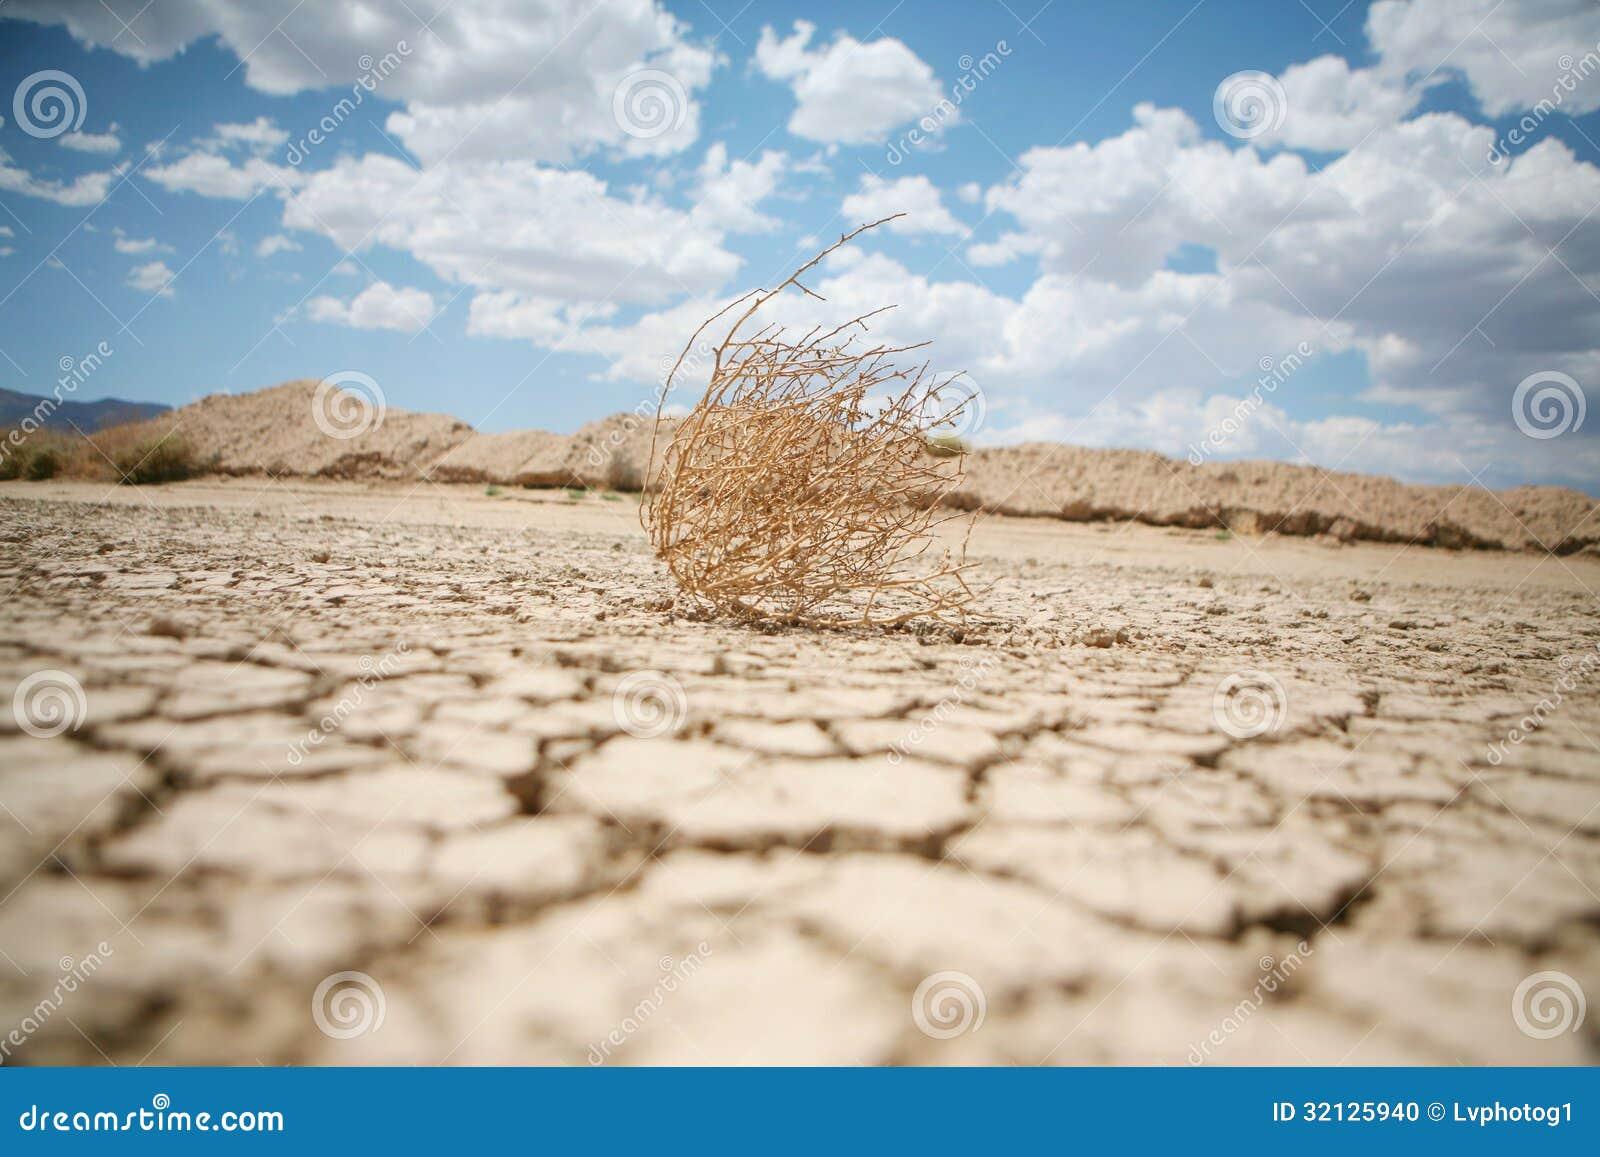 Amaranto nel deserto